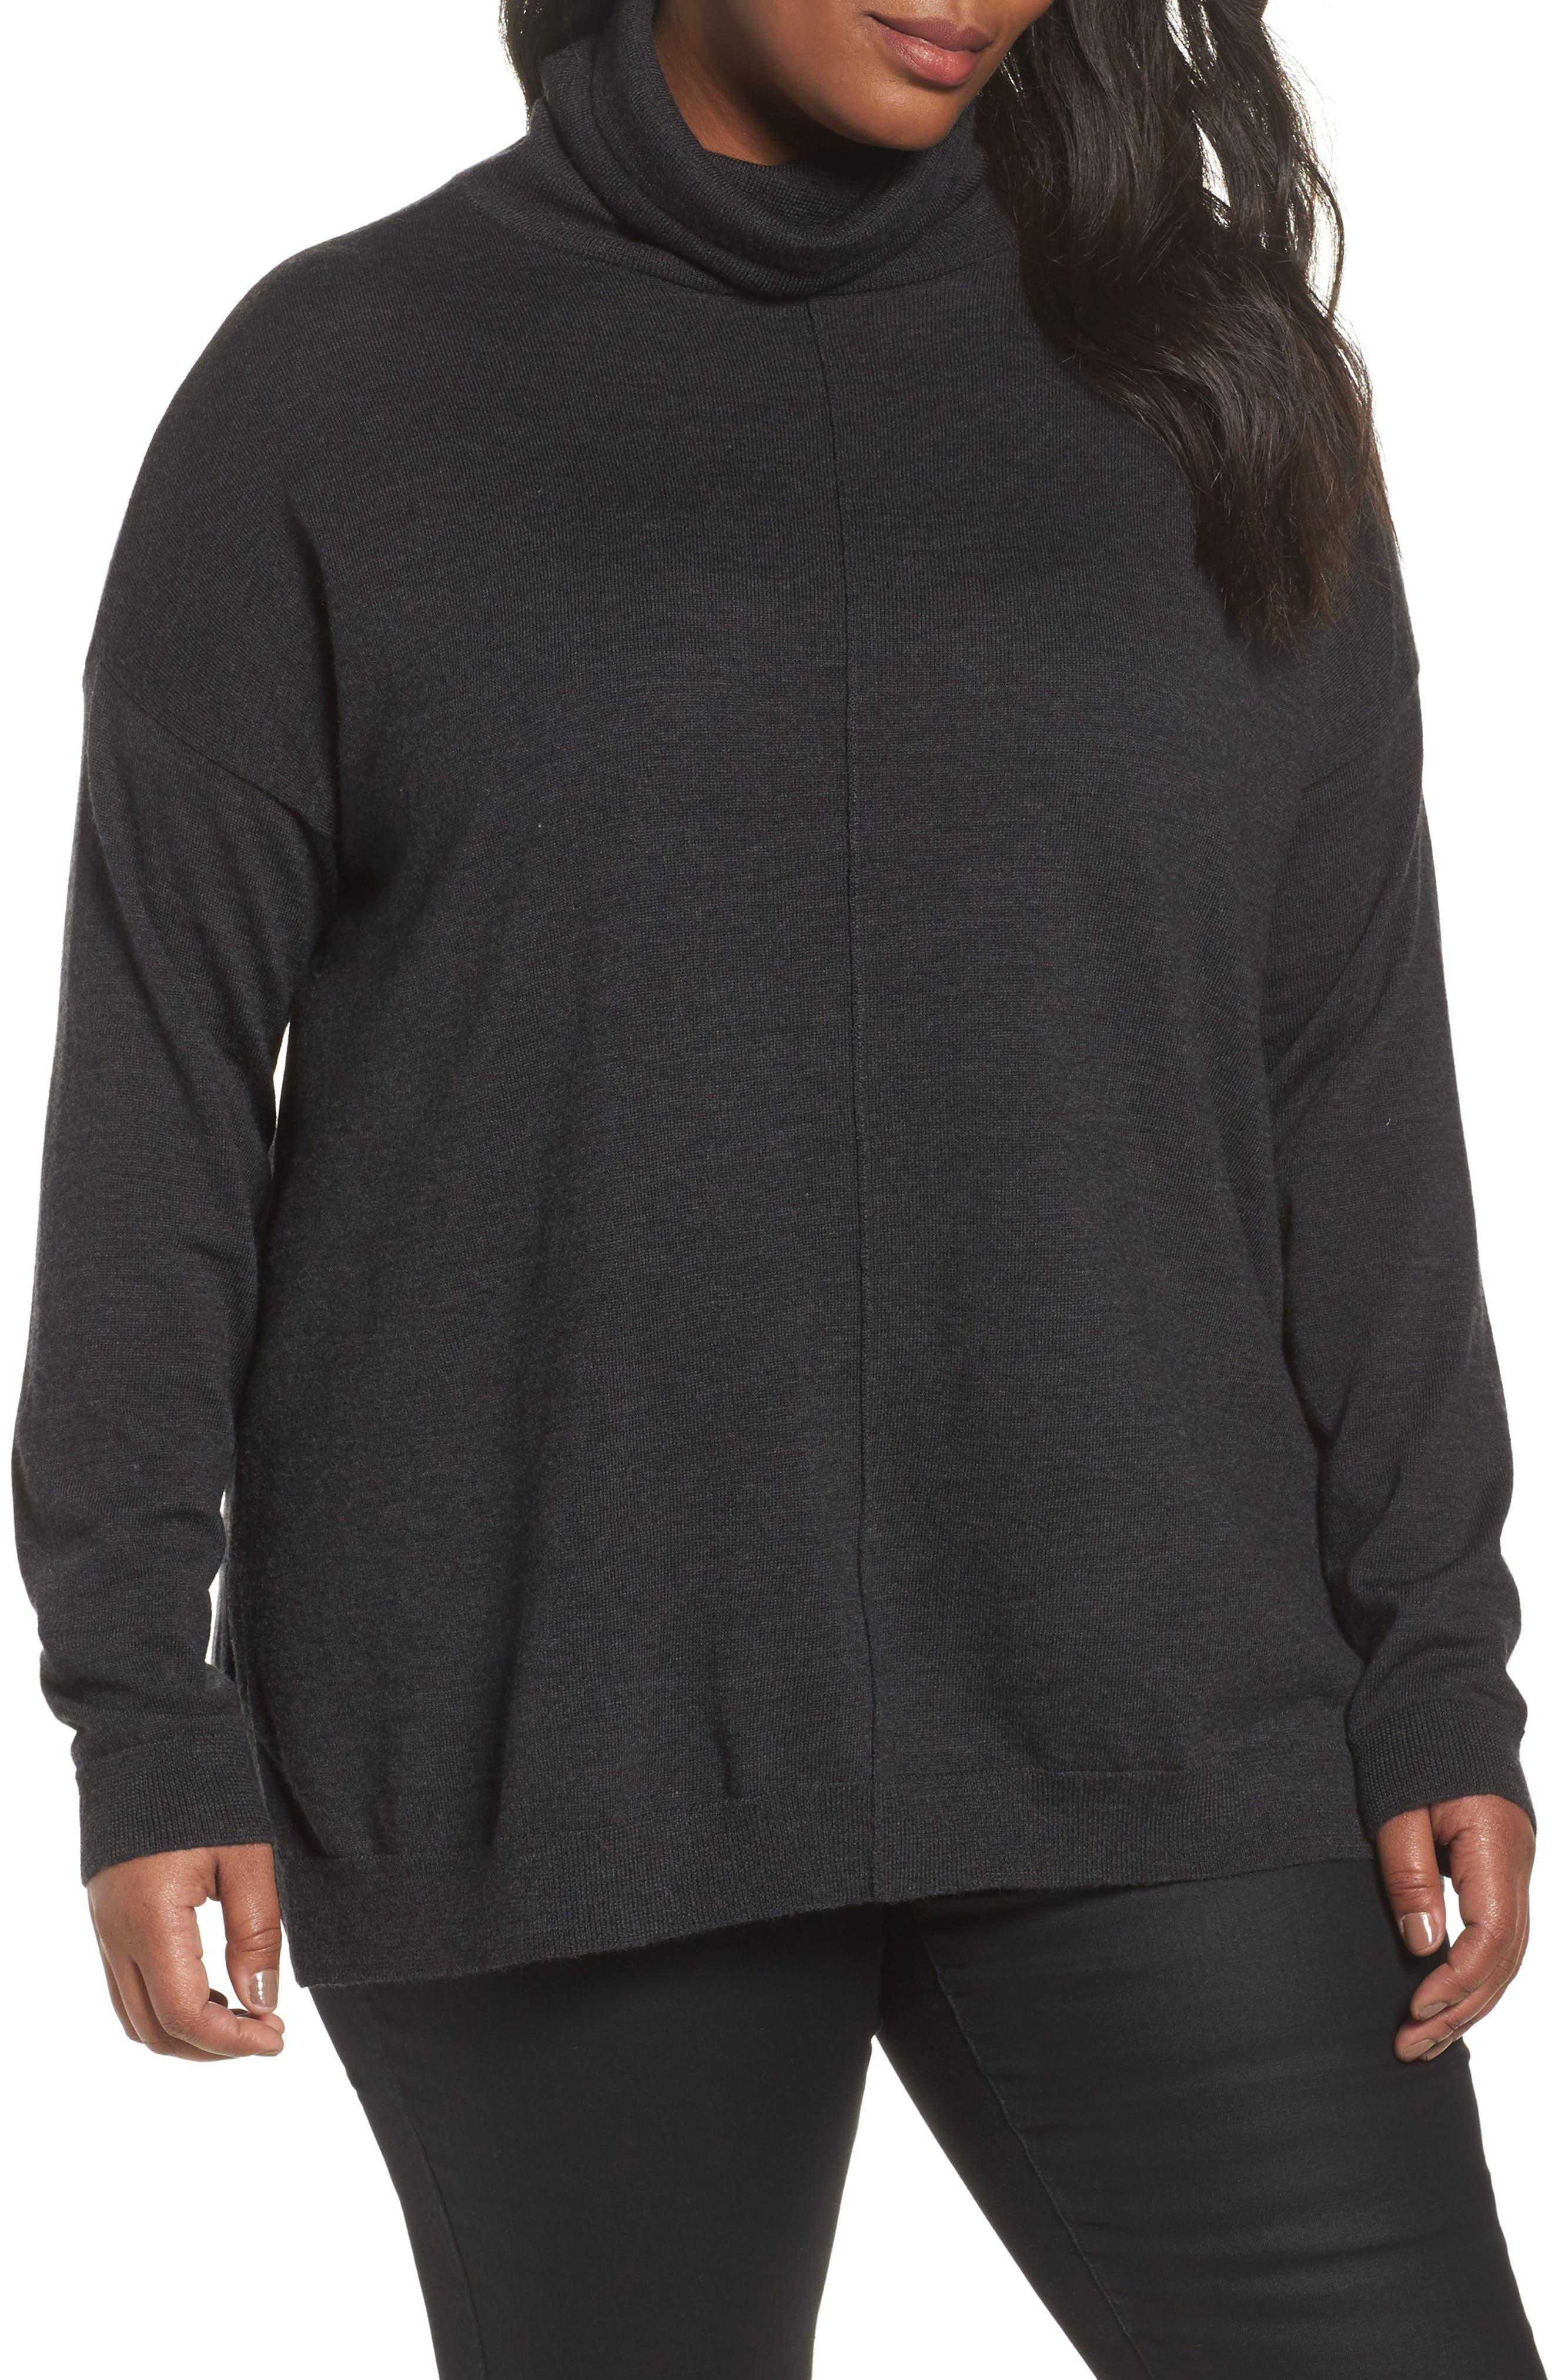 Main Image - Eileen Fisher Merino Wool Turtleneck Sweater (Plus Size)